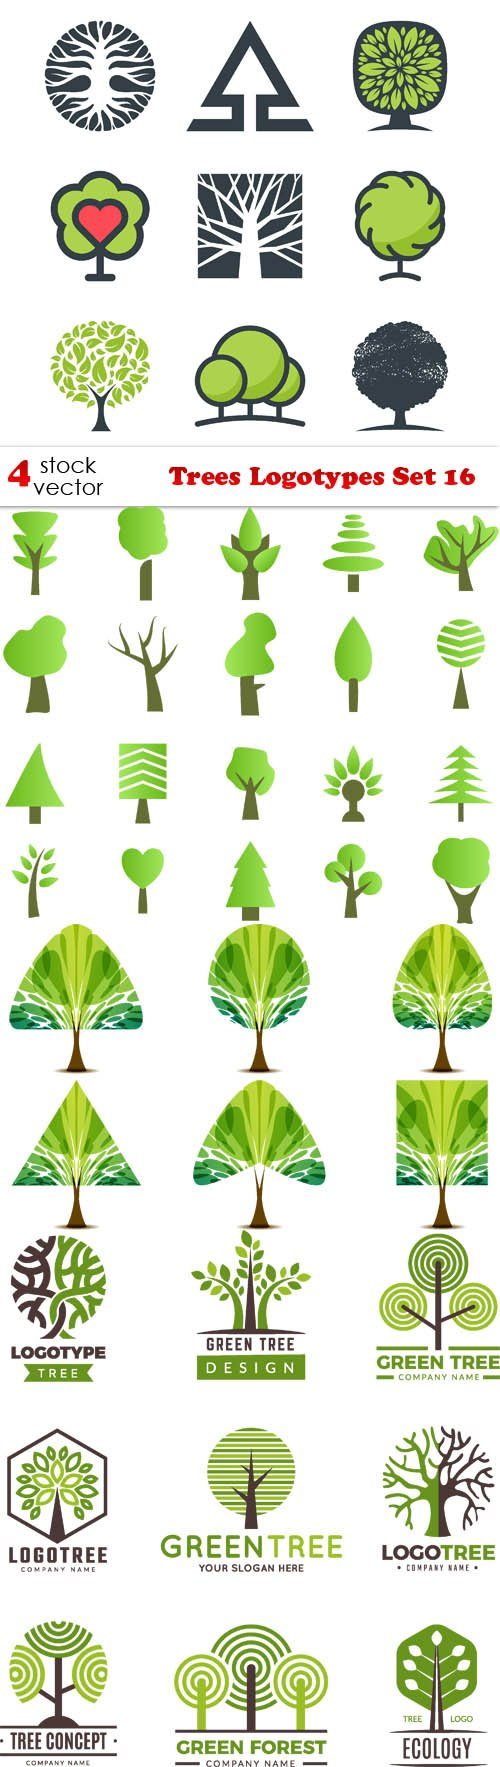 Vectors - Trees Logotypes Set 16